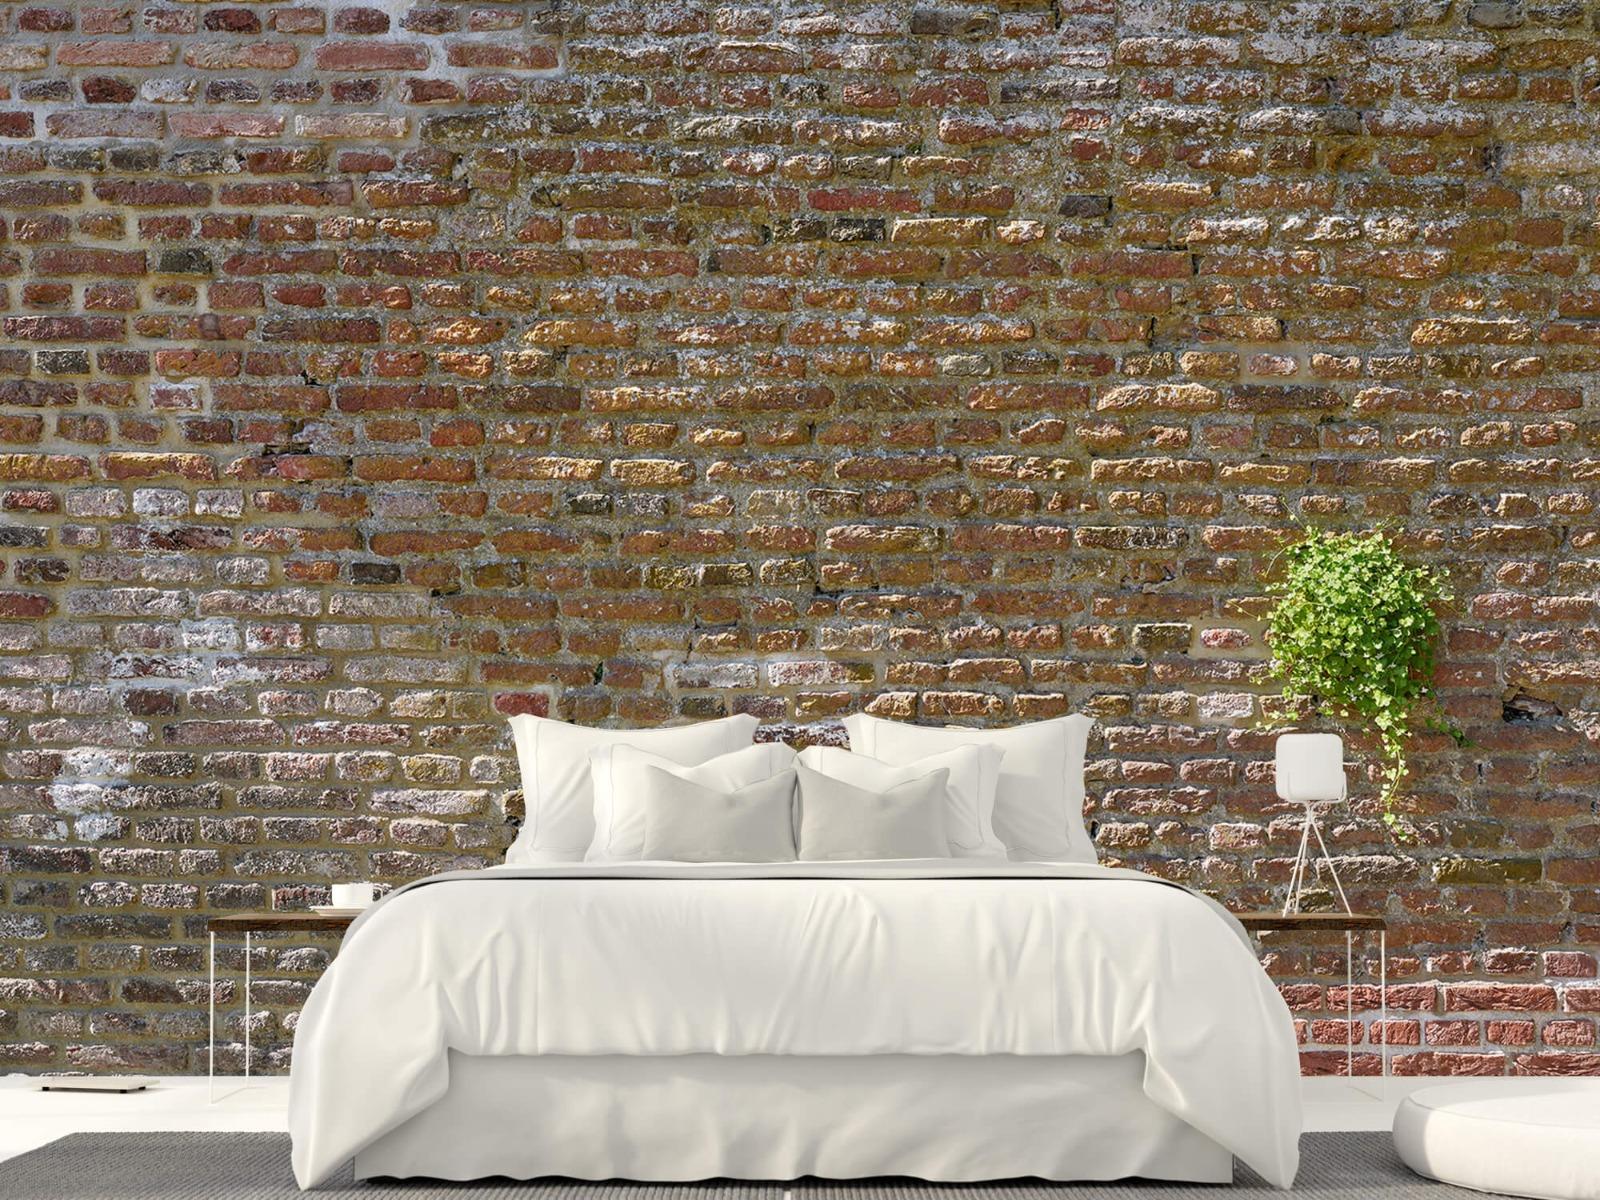 Stenen - Oude stenen stadsmuur met plantjes 23